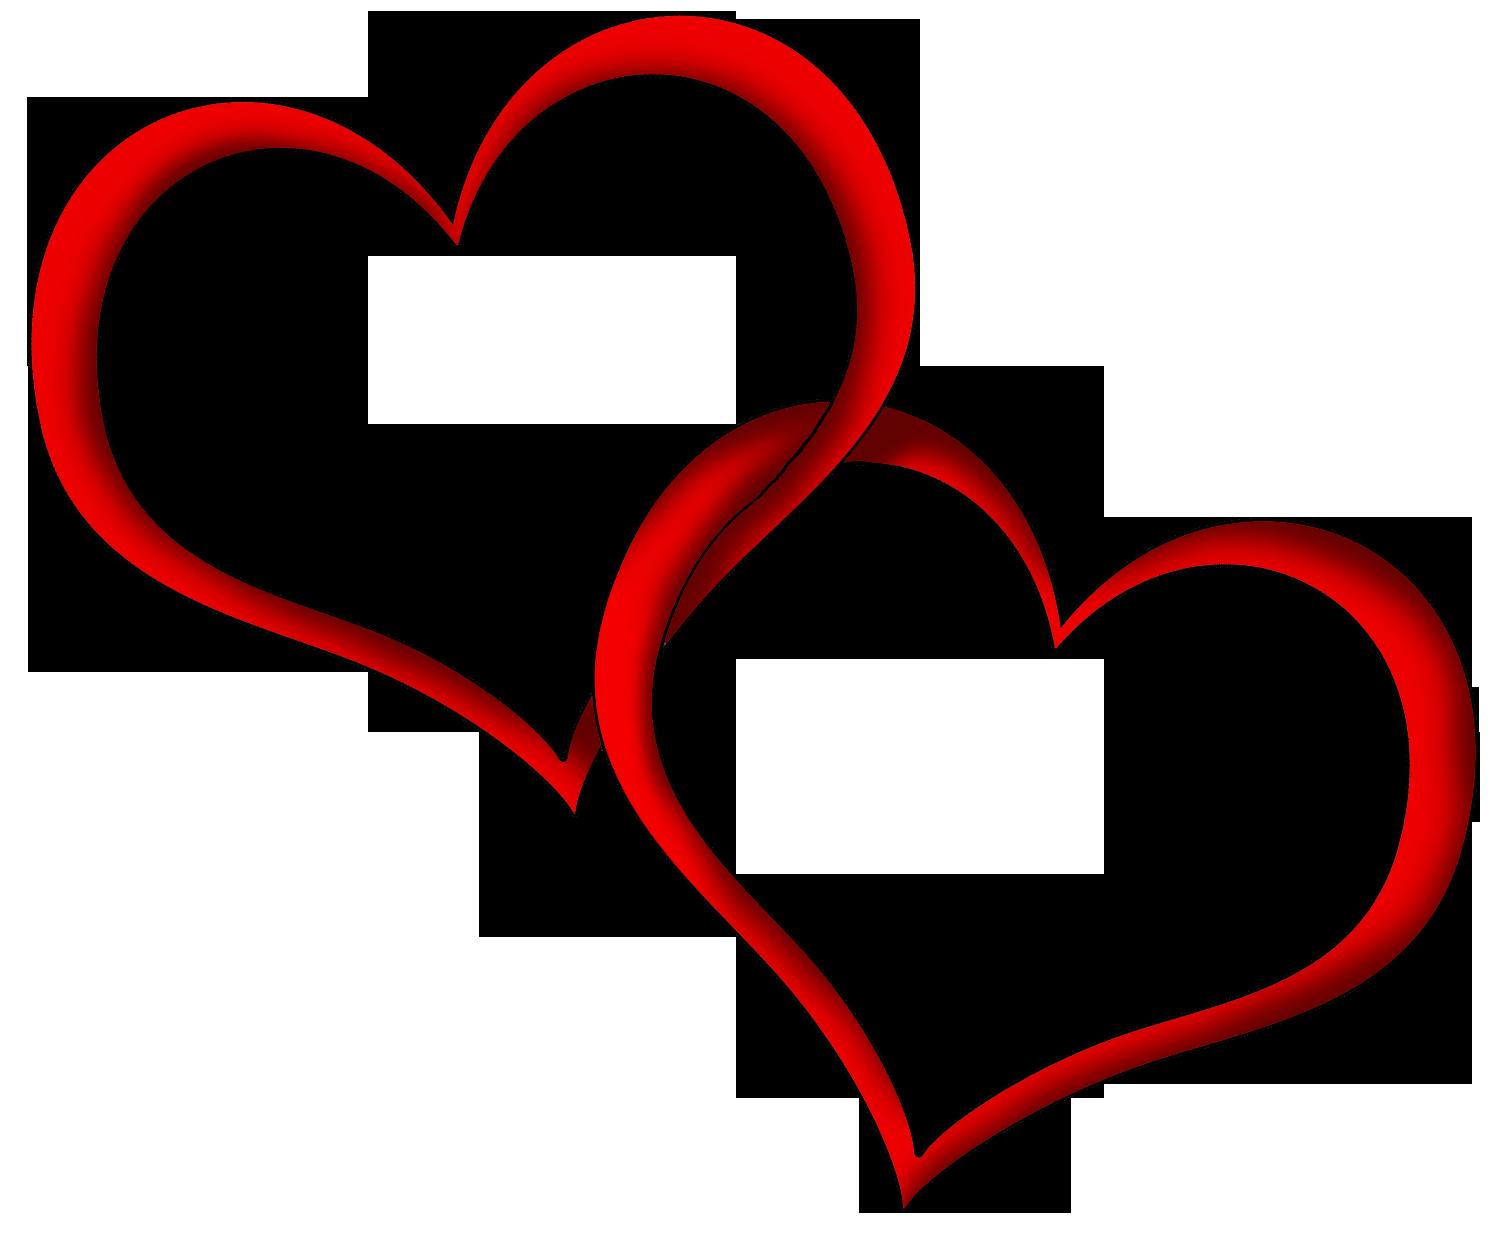 Heart PNG HD - 145152